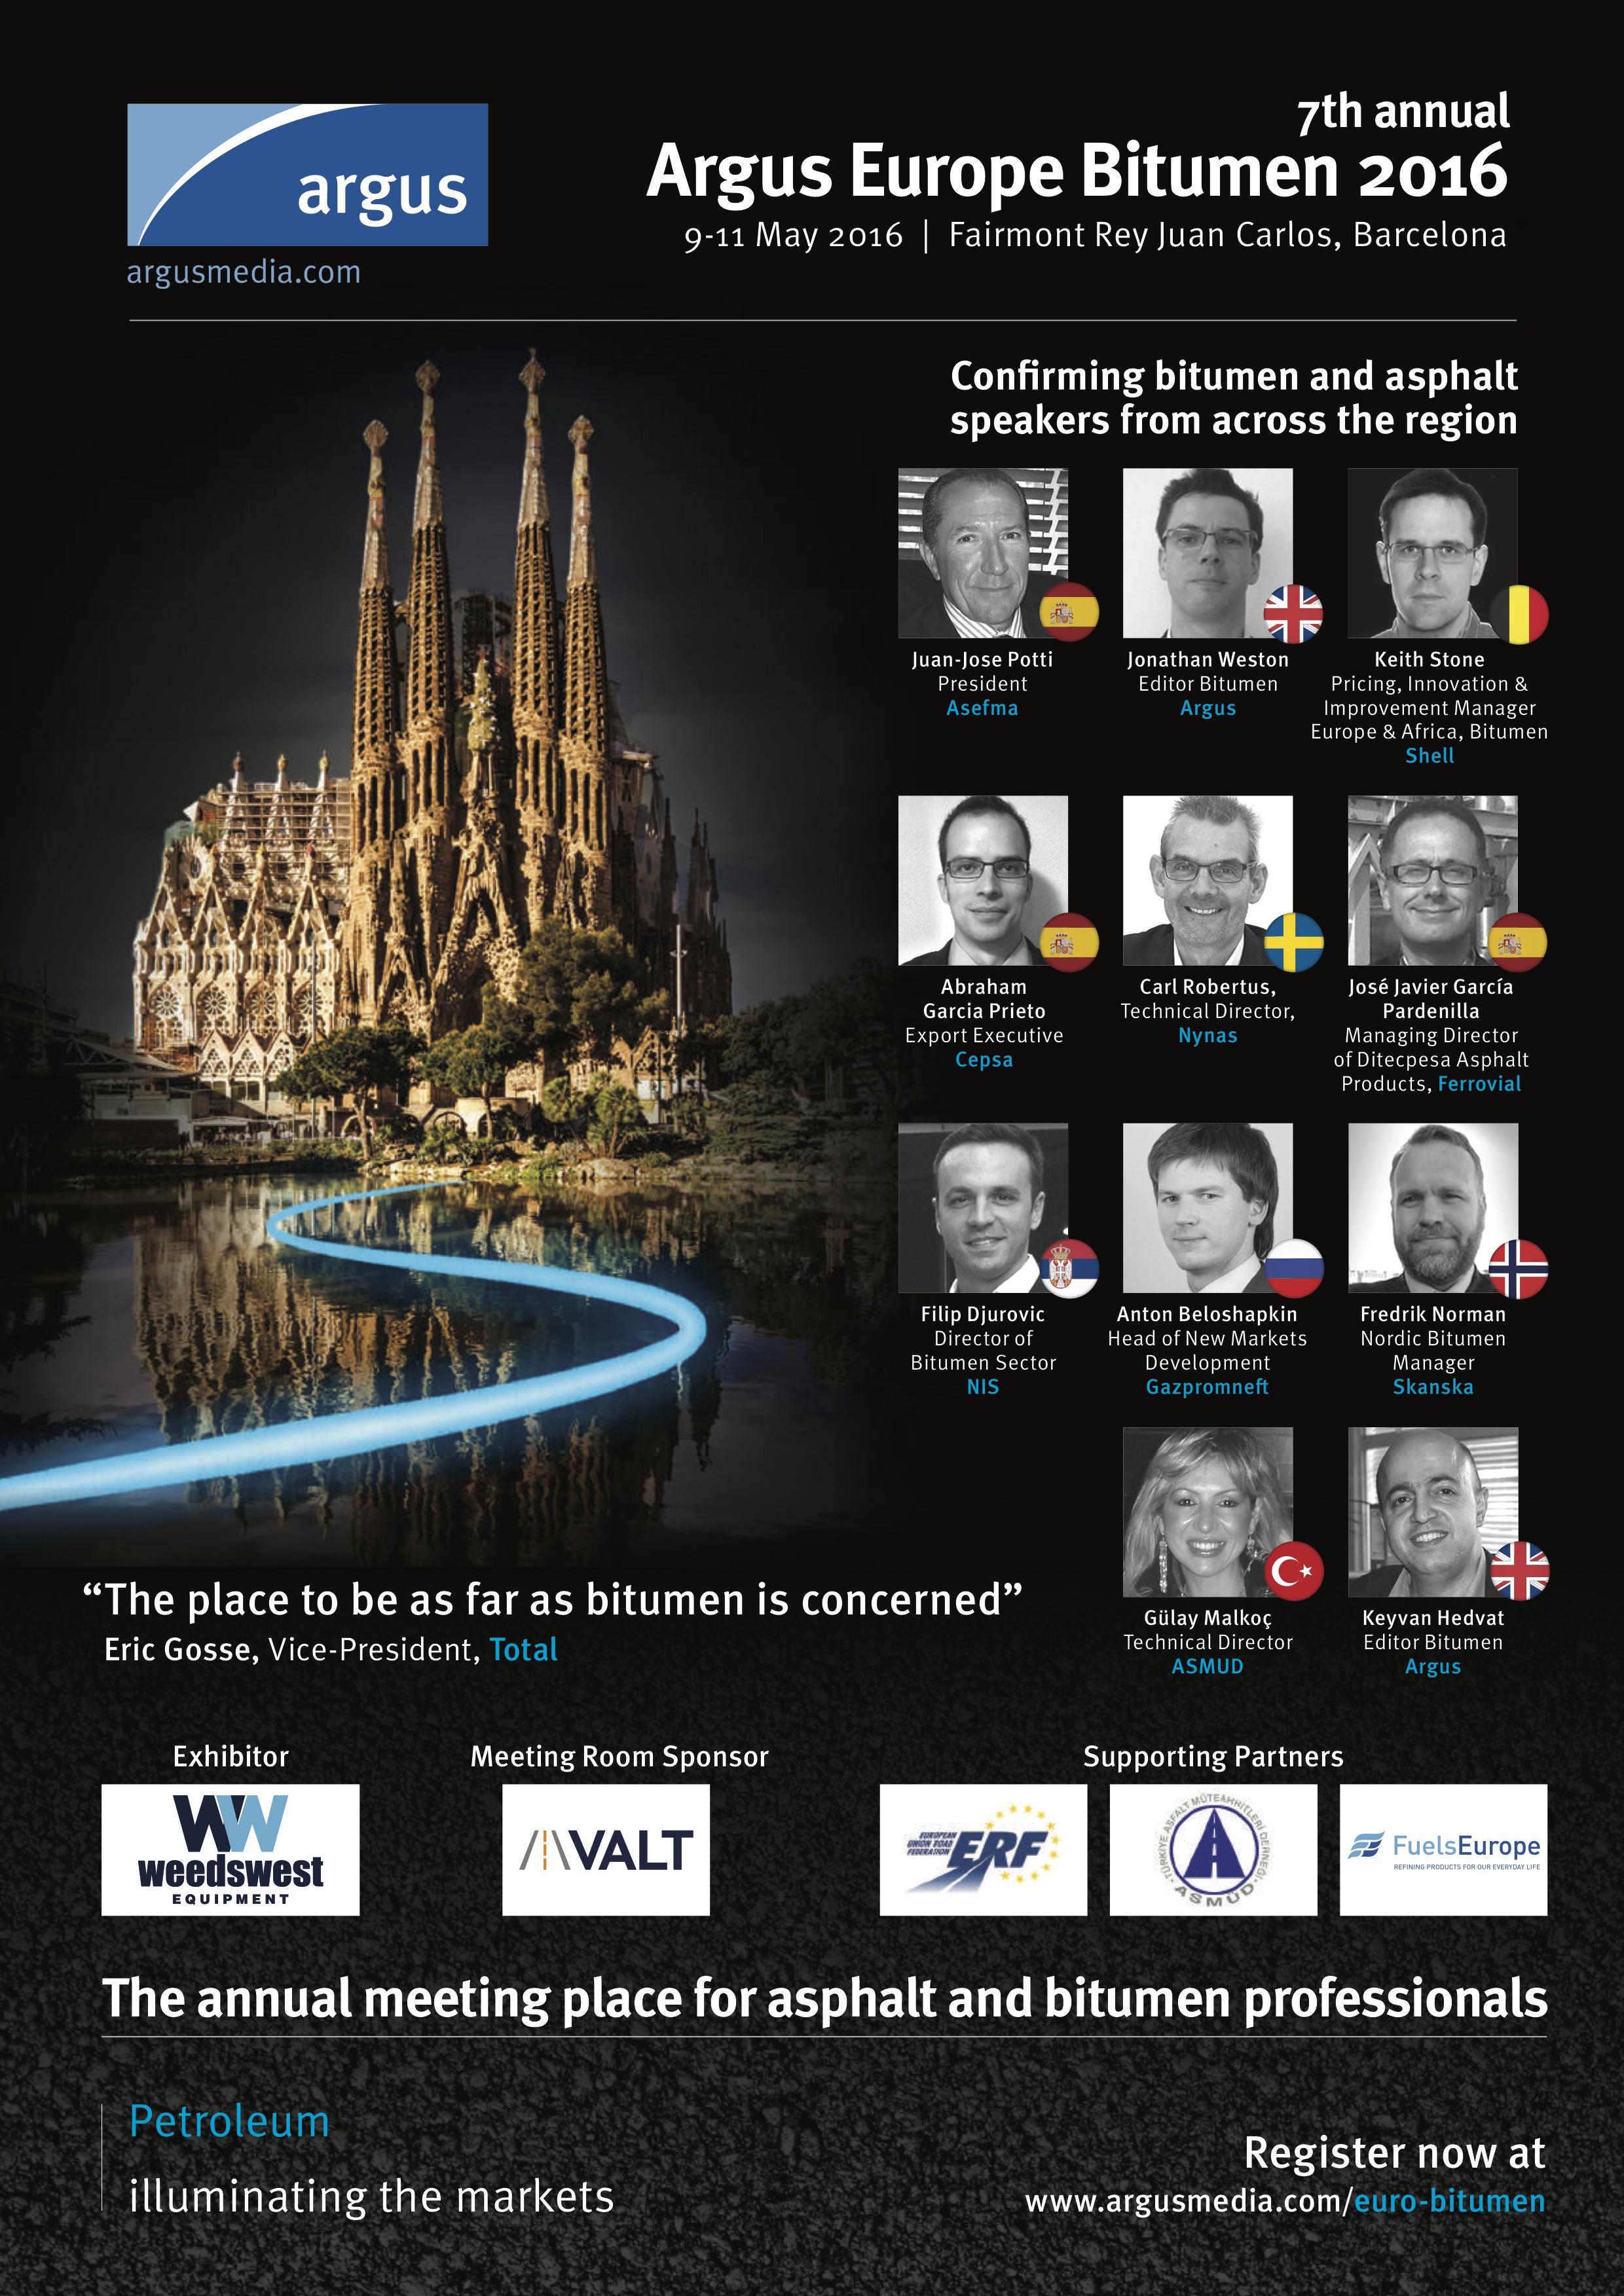 Agenda - Argus Europe Bitumen Conference 2016